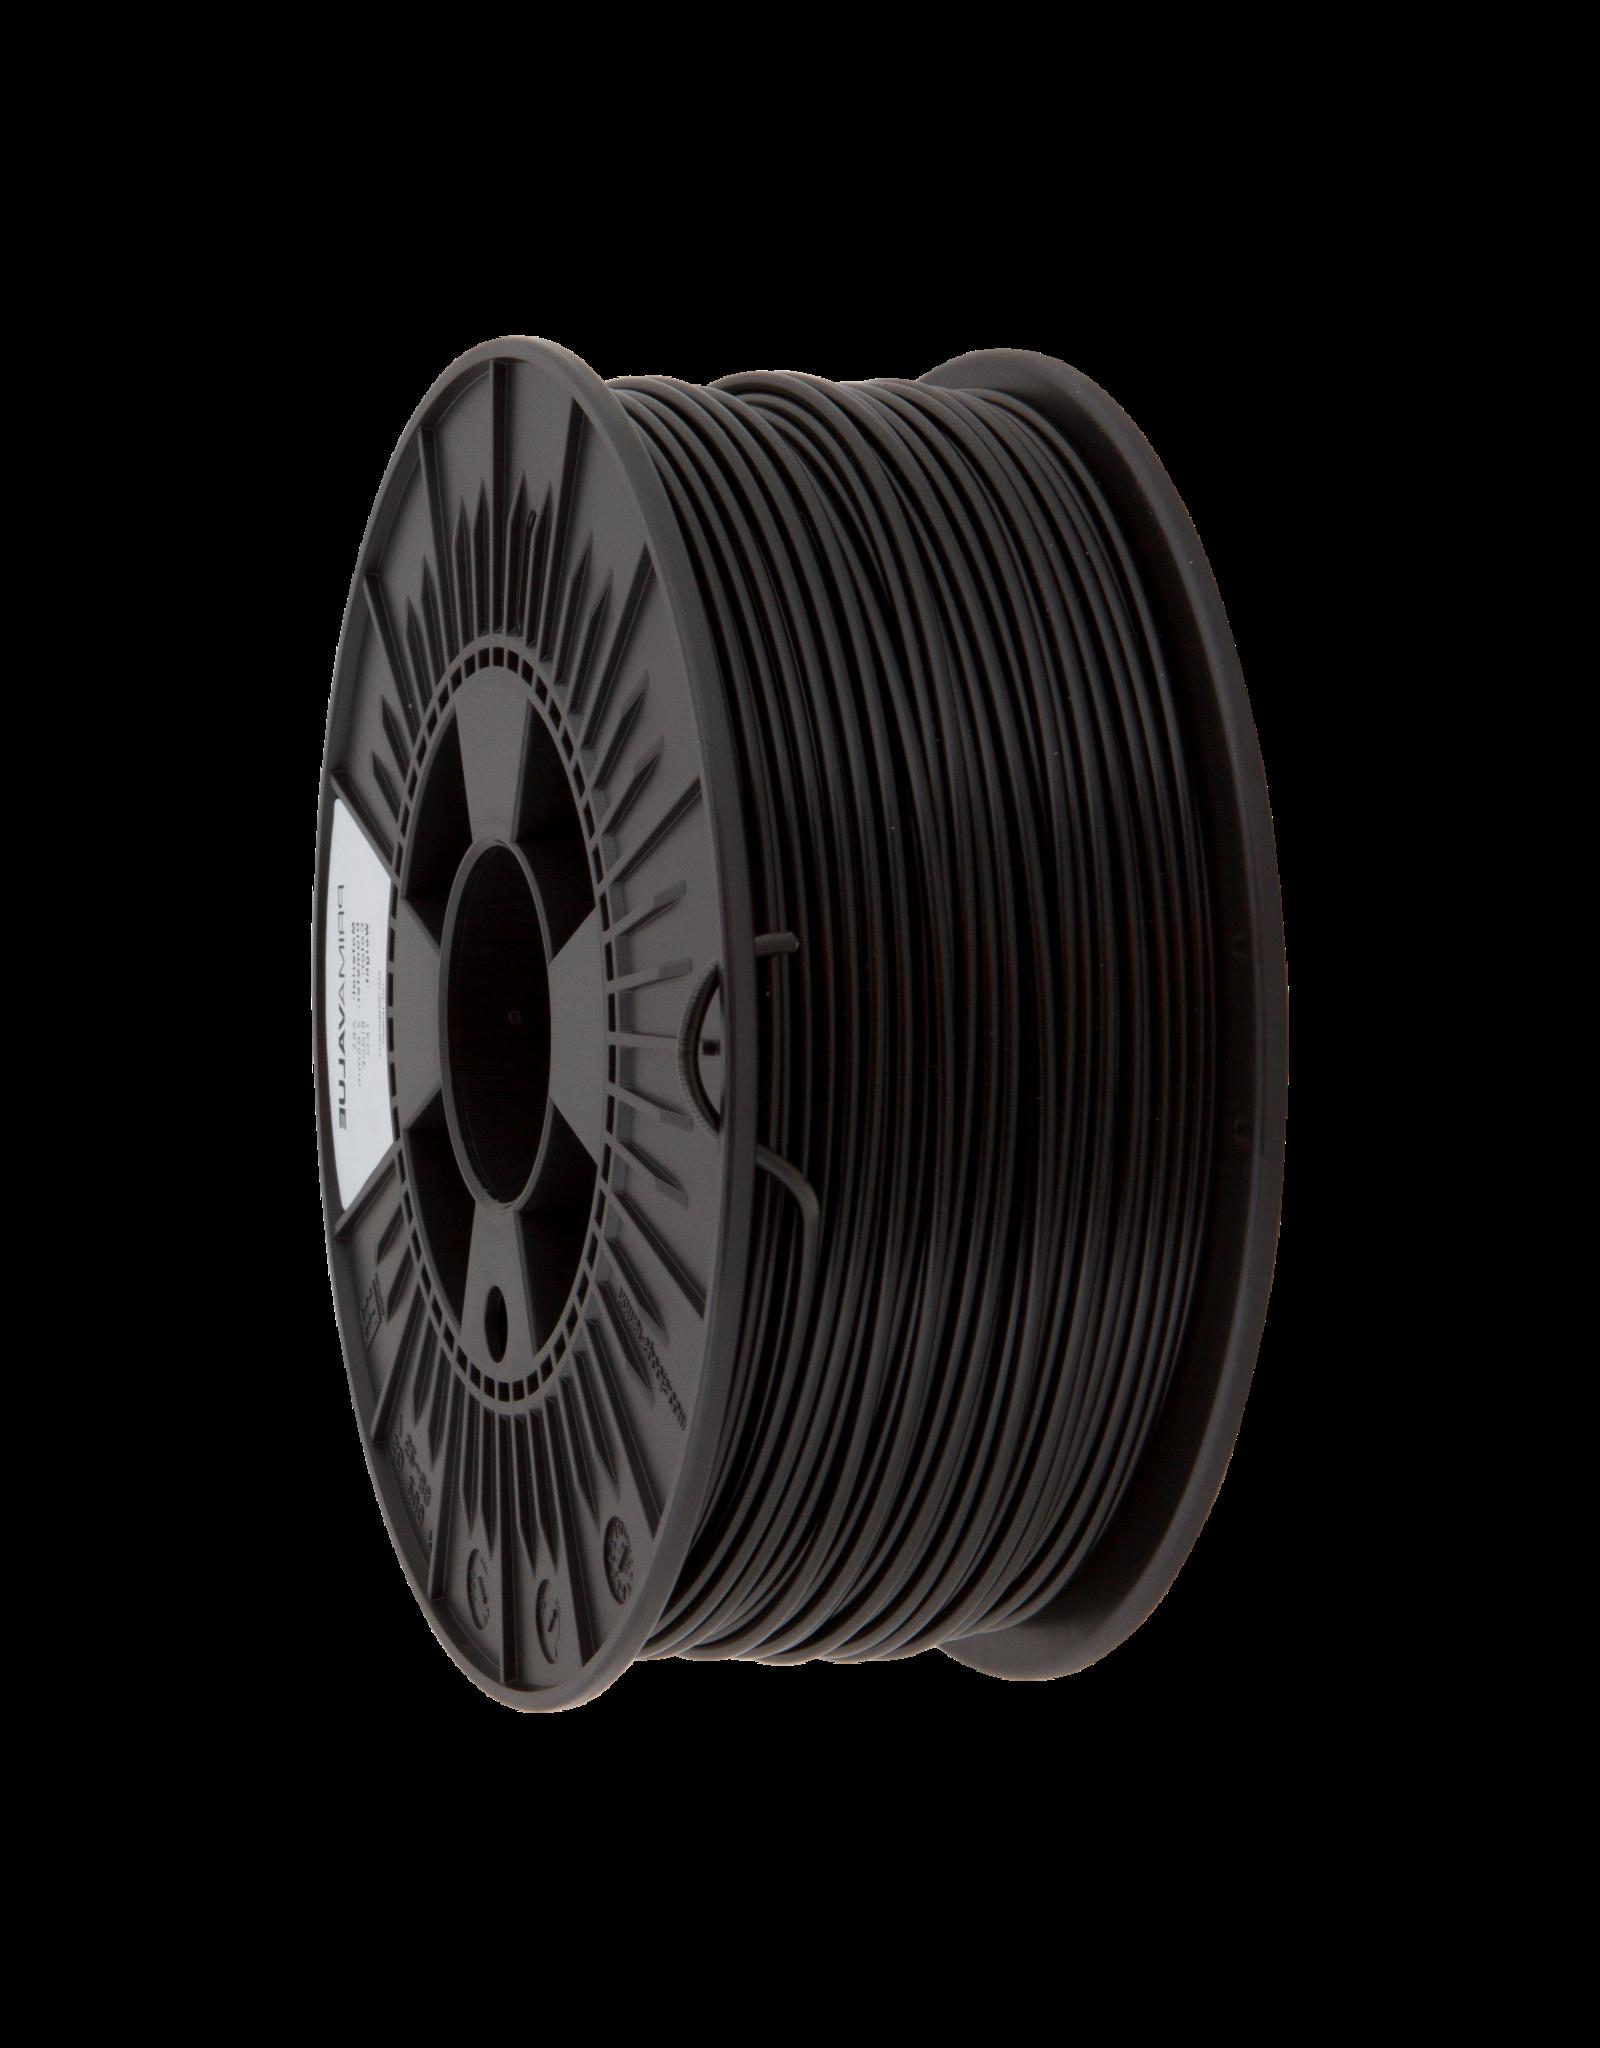 Prima PrimaValue ABS Filament - 2.85mm - 1 kg - Zwart